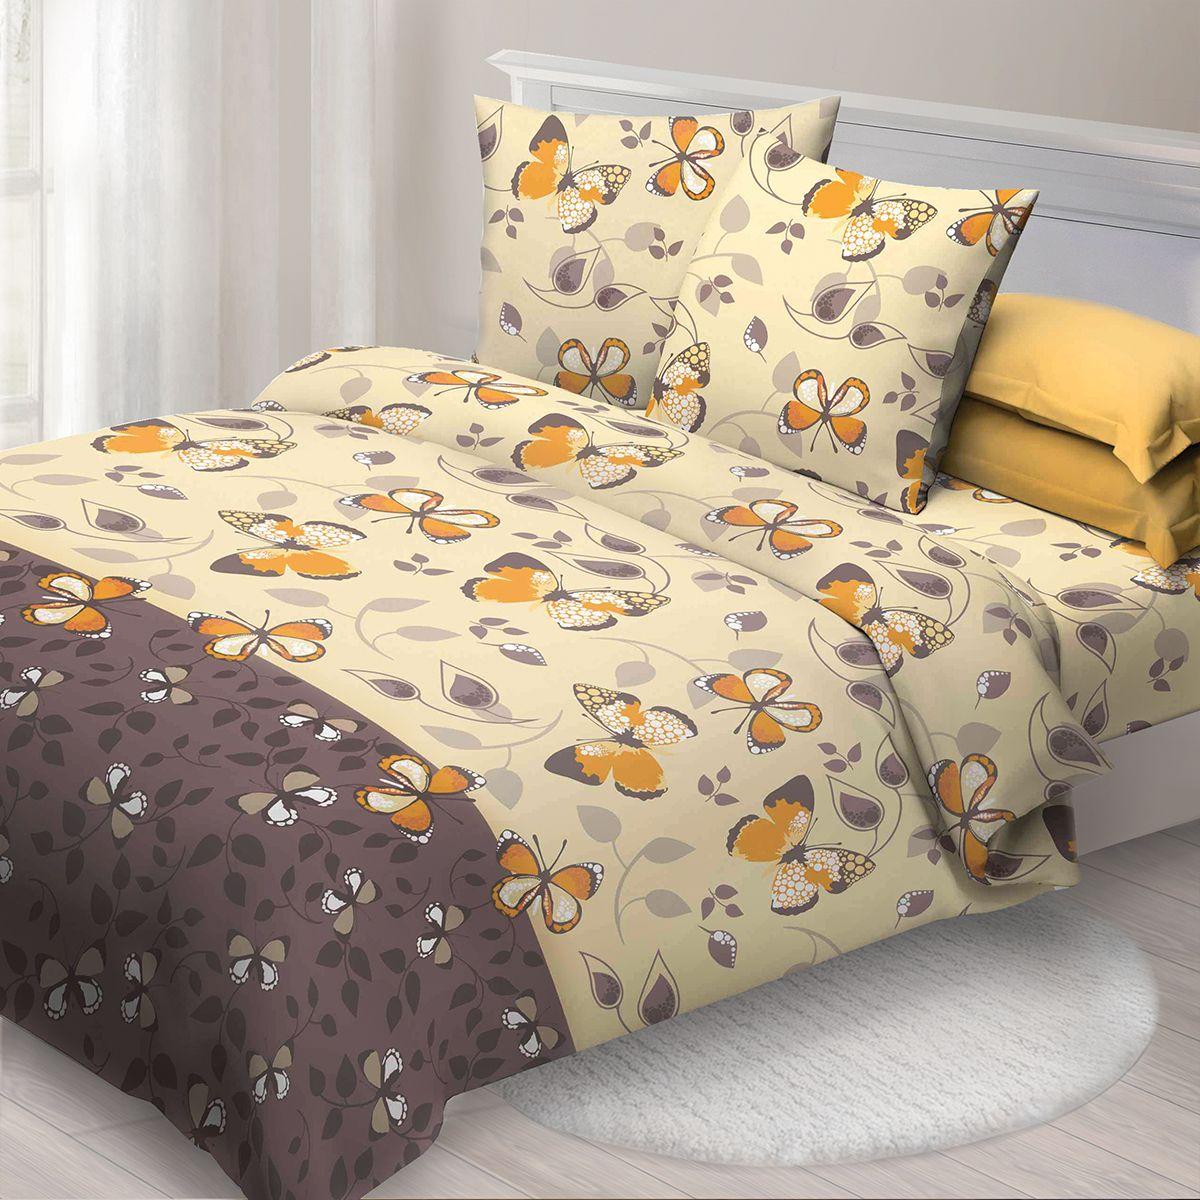 Комплект белья Спал Спалыч Фарфалла, евро, наволочки 70x70, цвет: желтый. 4079-182465